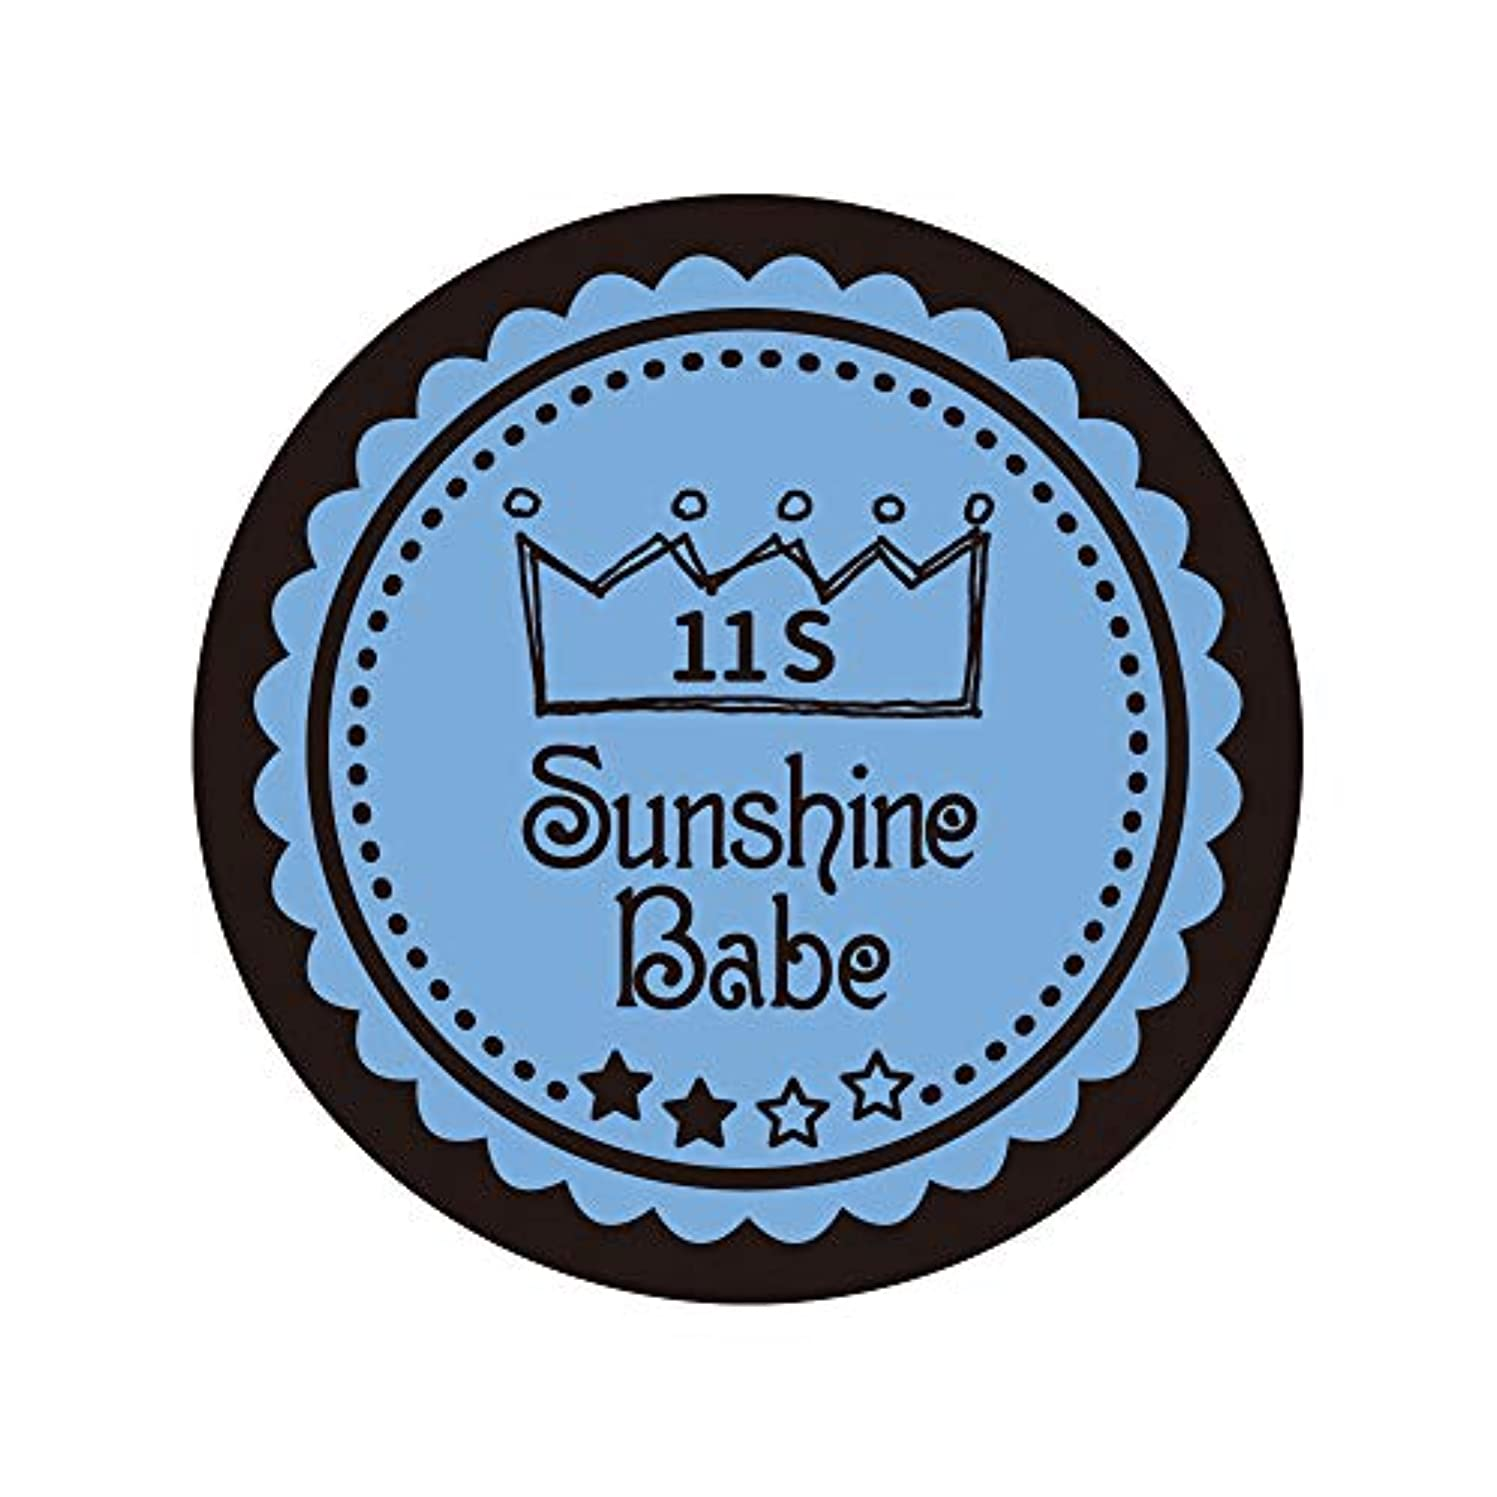 Sunshine Babe コスメティックカラー 11S リトルボーイブルー 4g UV/LED対応